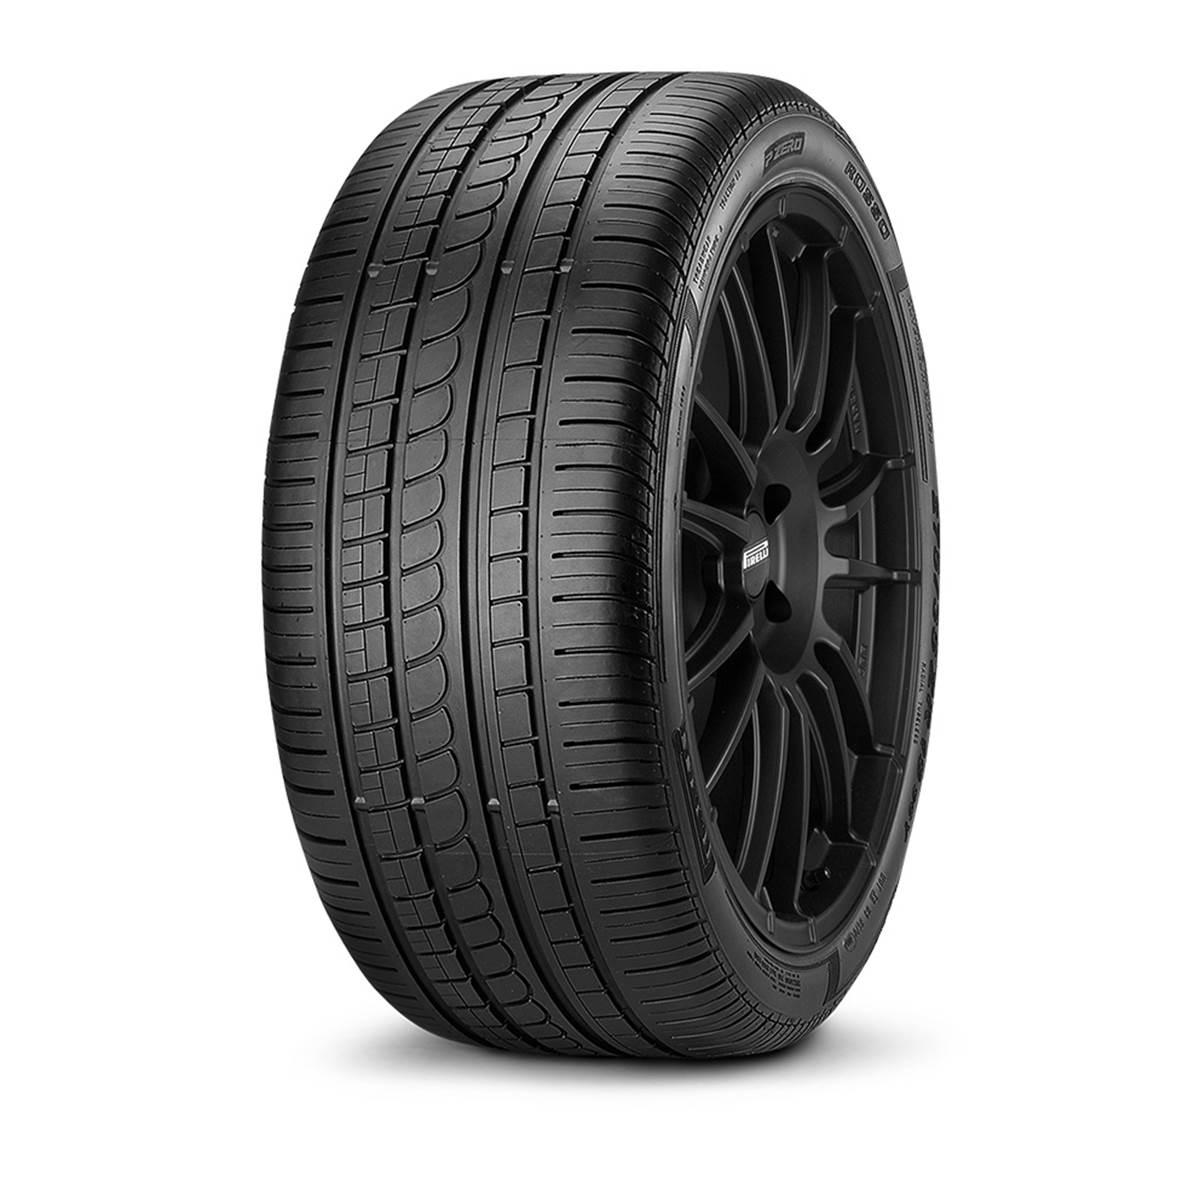 Pneu Pirelli 255/35R19 96Y Pzero Rosso Asimmetrico XL